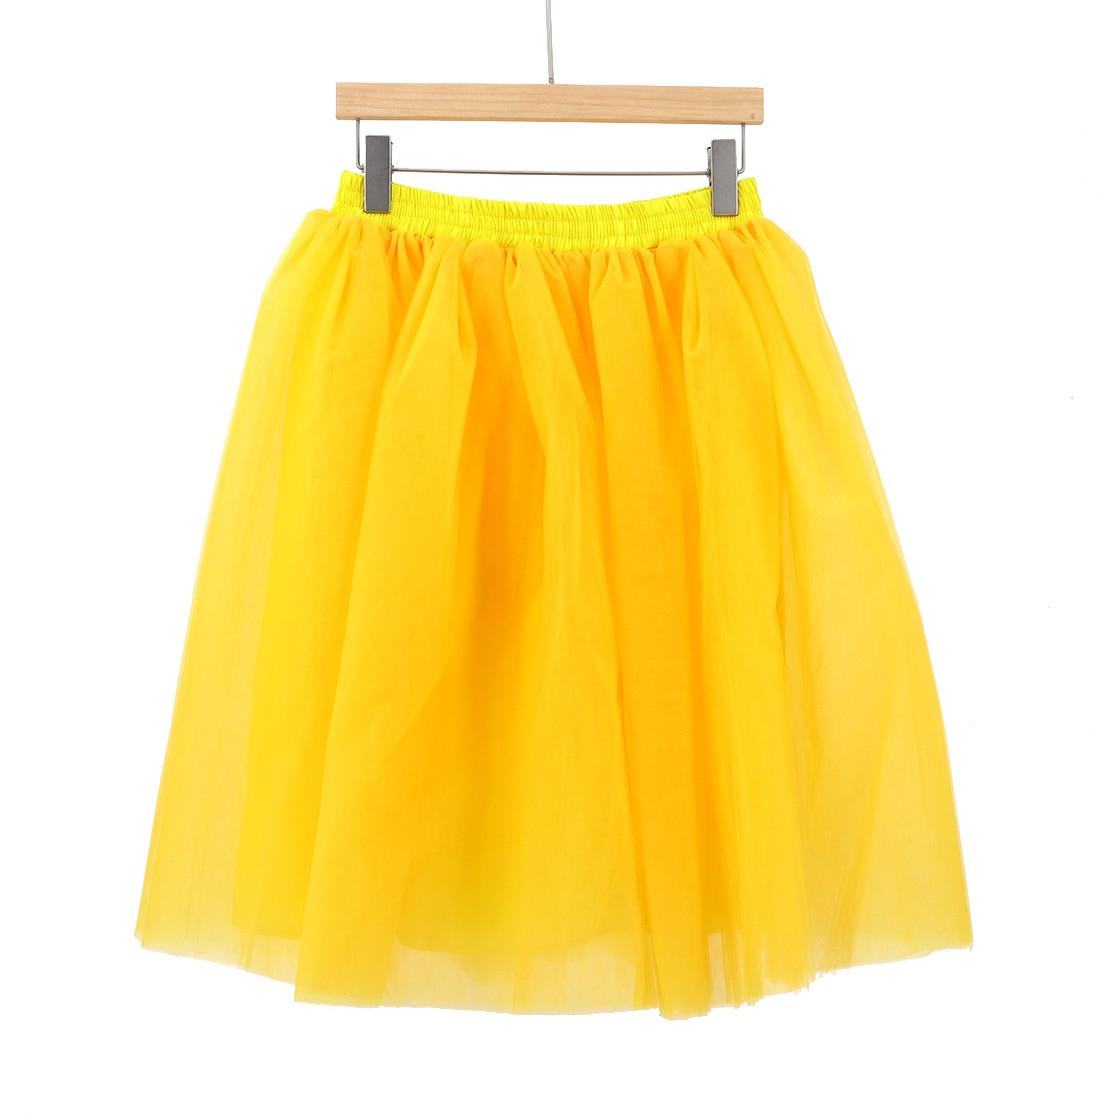 19cf0353d2 7 Layers 60cm Tutu Tulle Skirt Vintage Midi Pleated Skirts Yellow Womens  Lolita Bridesmaid Wedding faldas Mujer saias jupe-in Skirts from Women's  Clothing ...